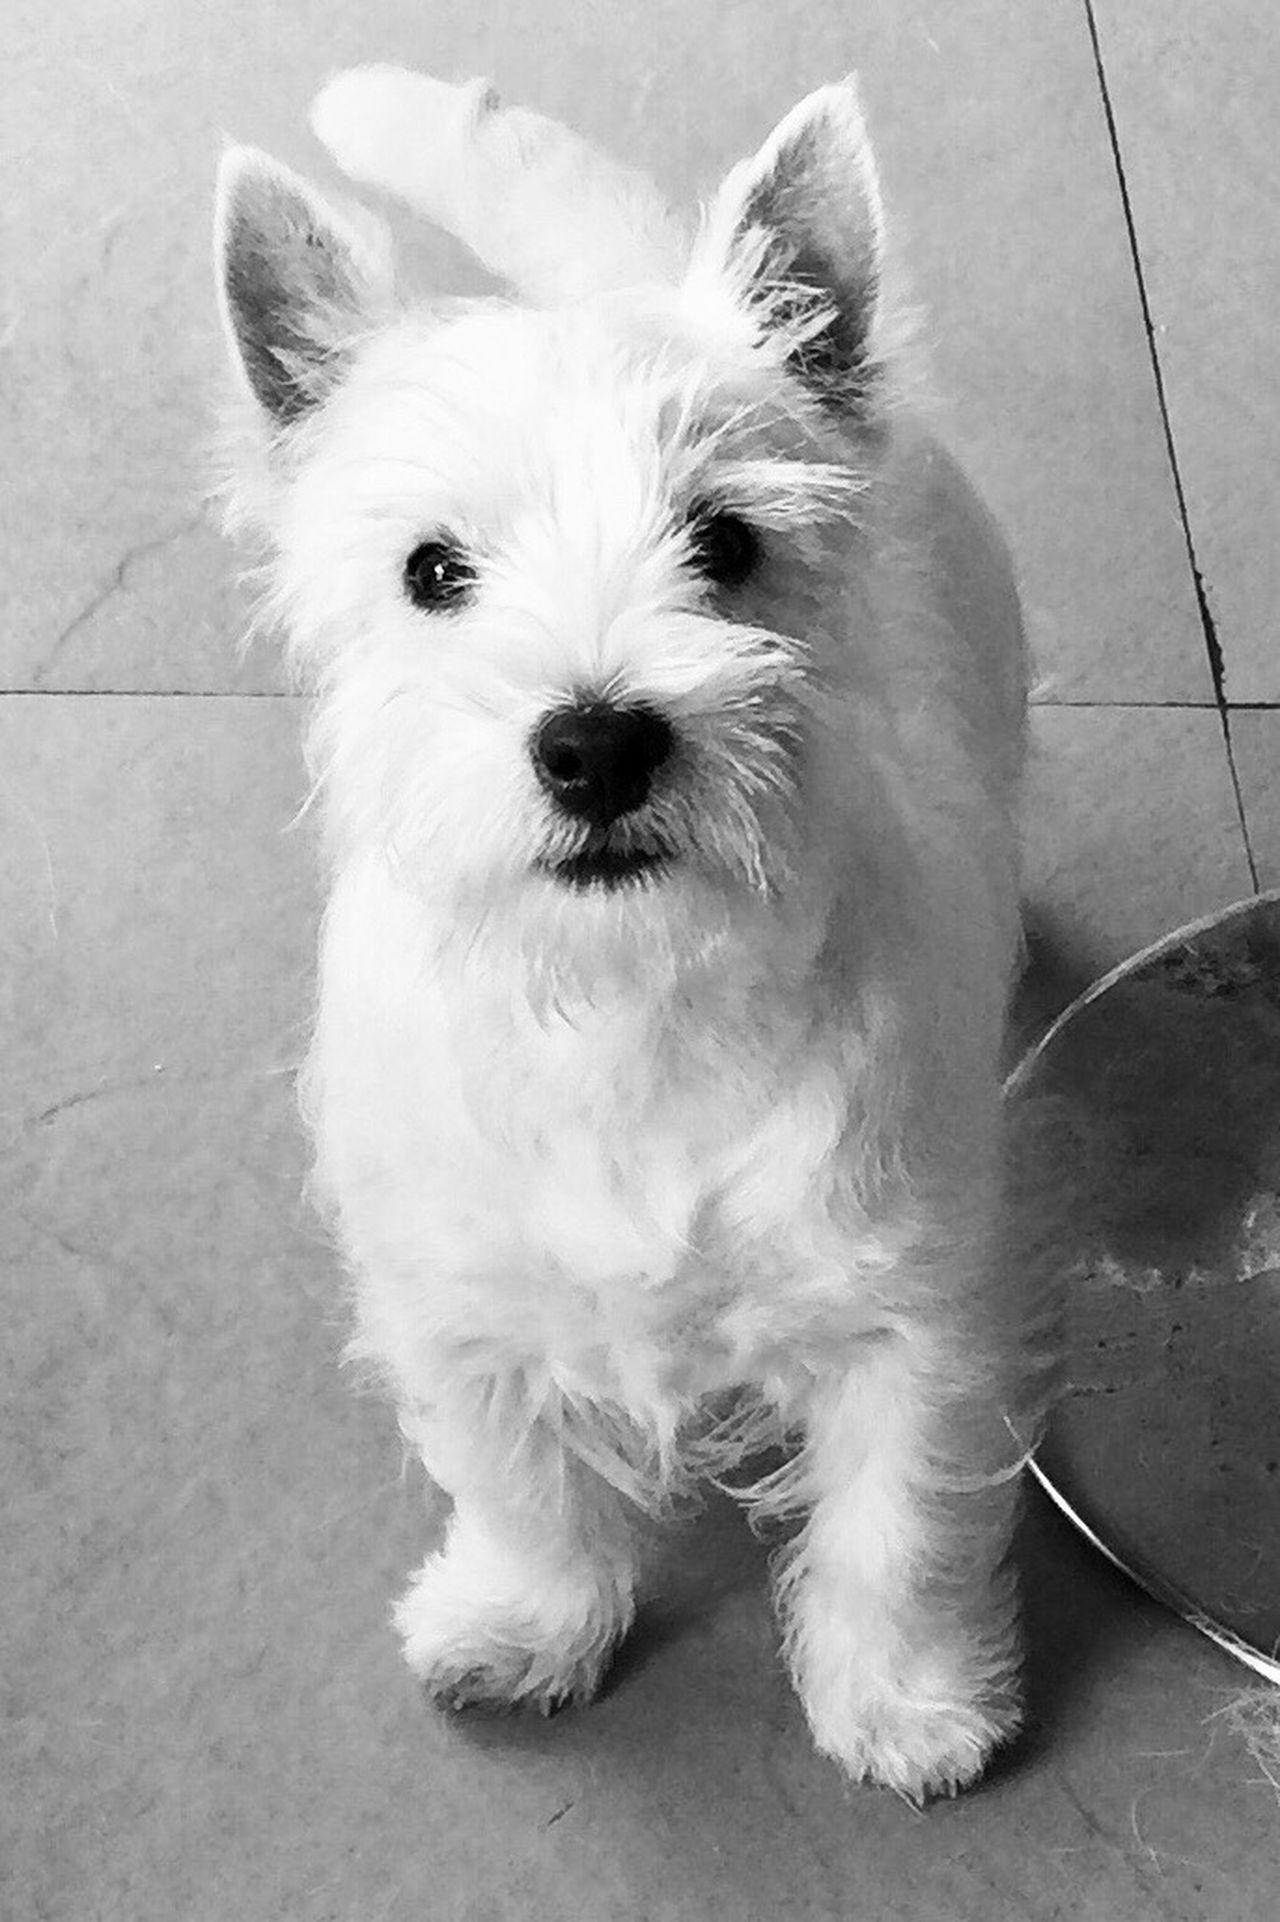 Sena Westies Westy Dog Puppy Perro White Blanco B&W Blanco y Negro Animal Themes